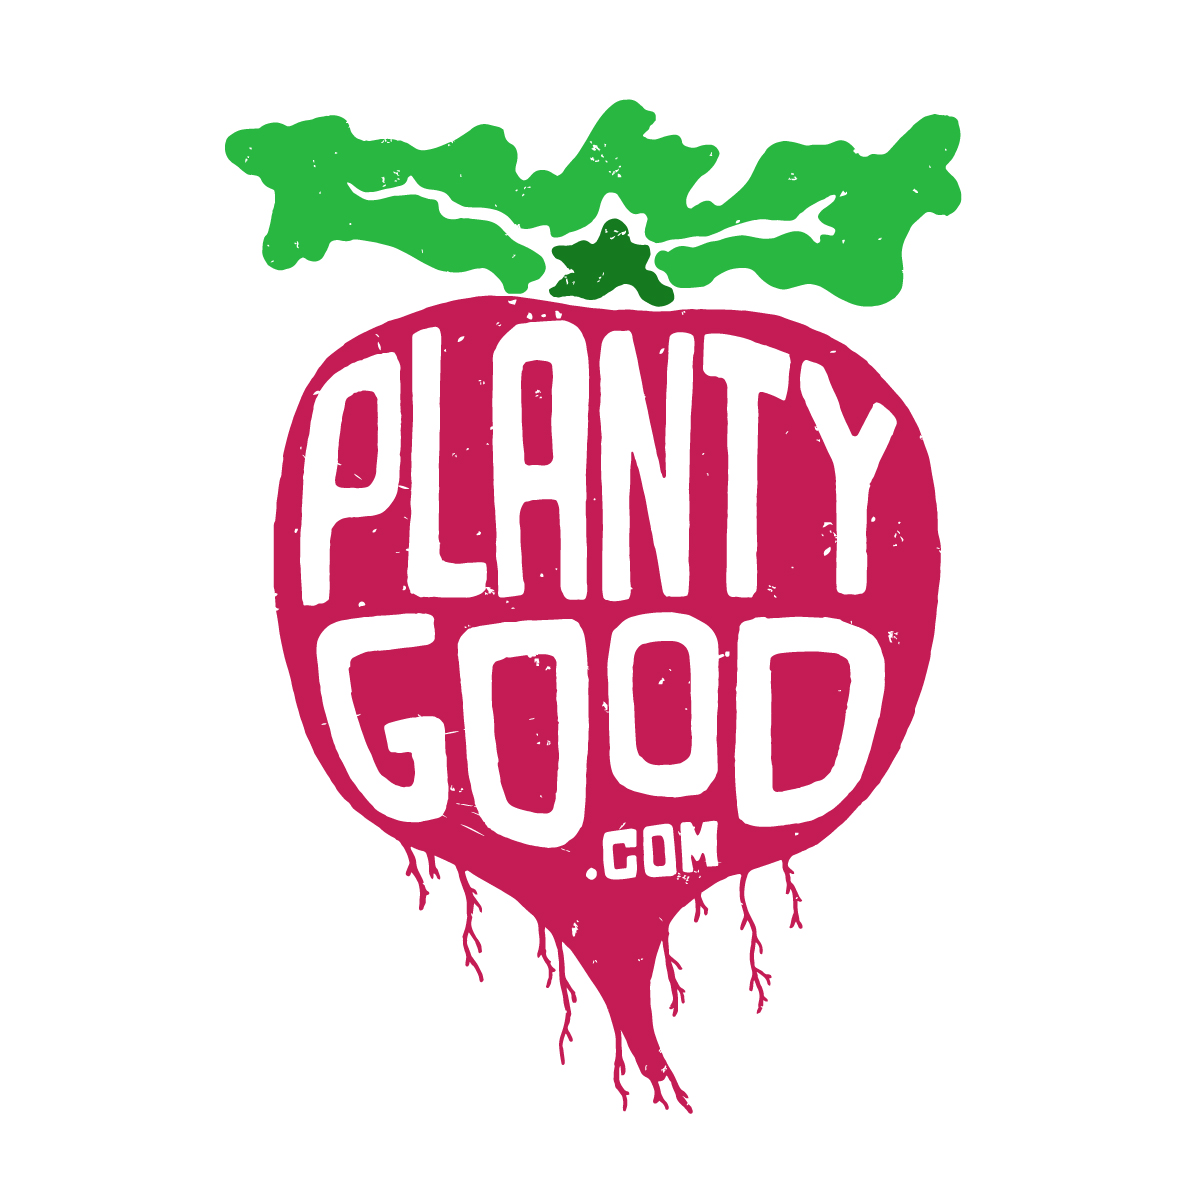 Planty-Good-Logo_color_1200x1200.jpg